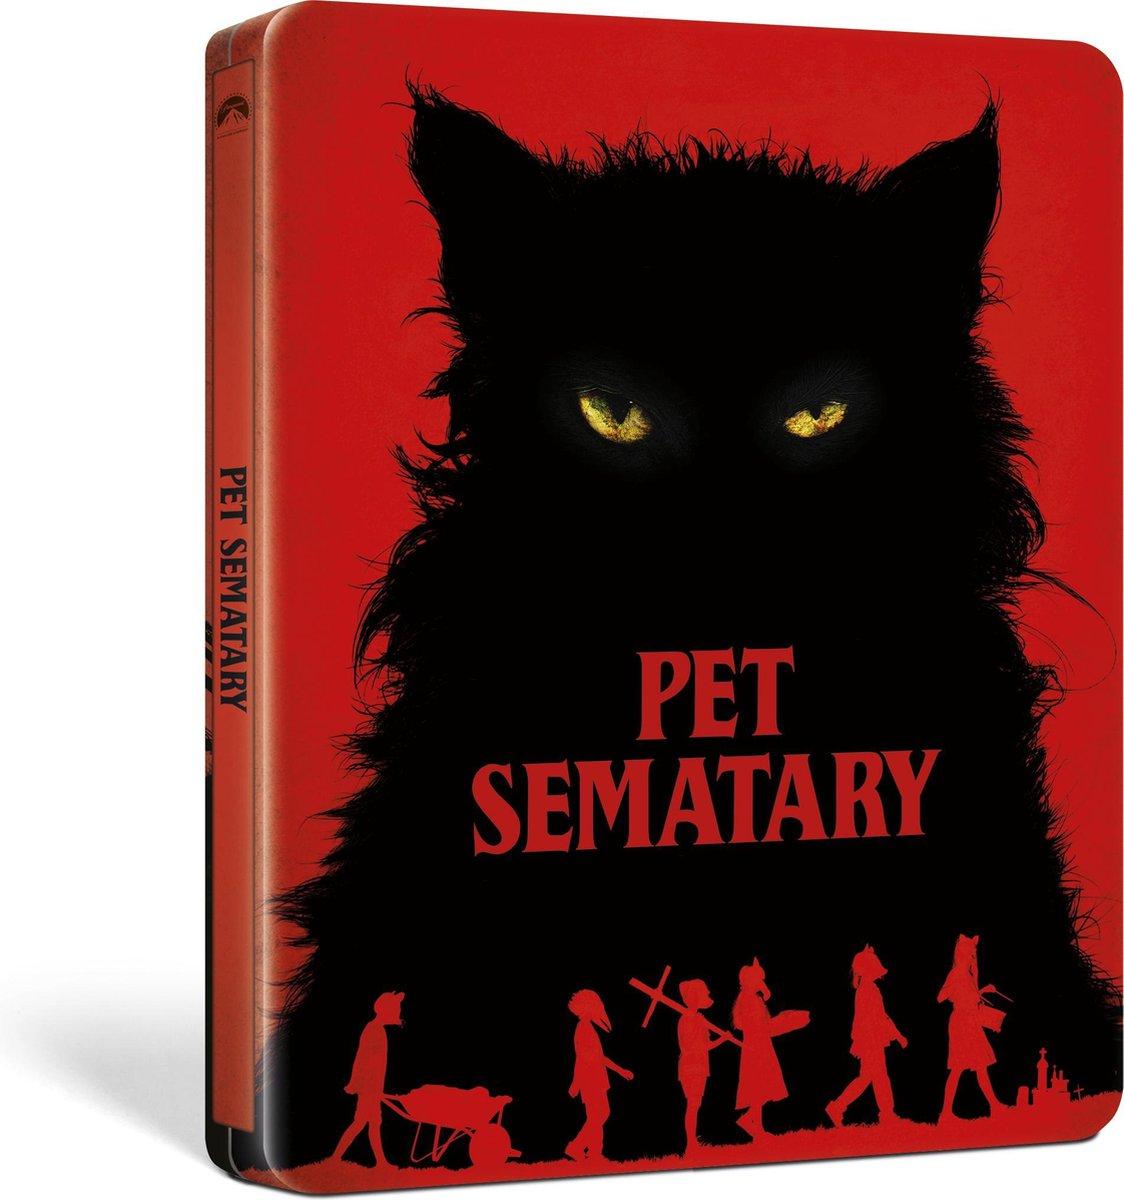 Pet Sematary (2019) (Steelbook) (4K Ultra HD Blu-ray)-